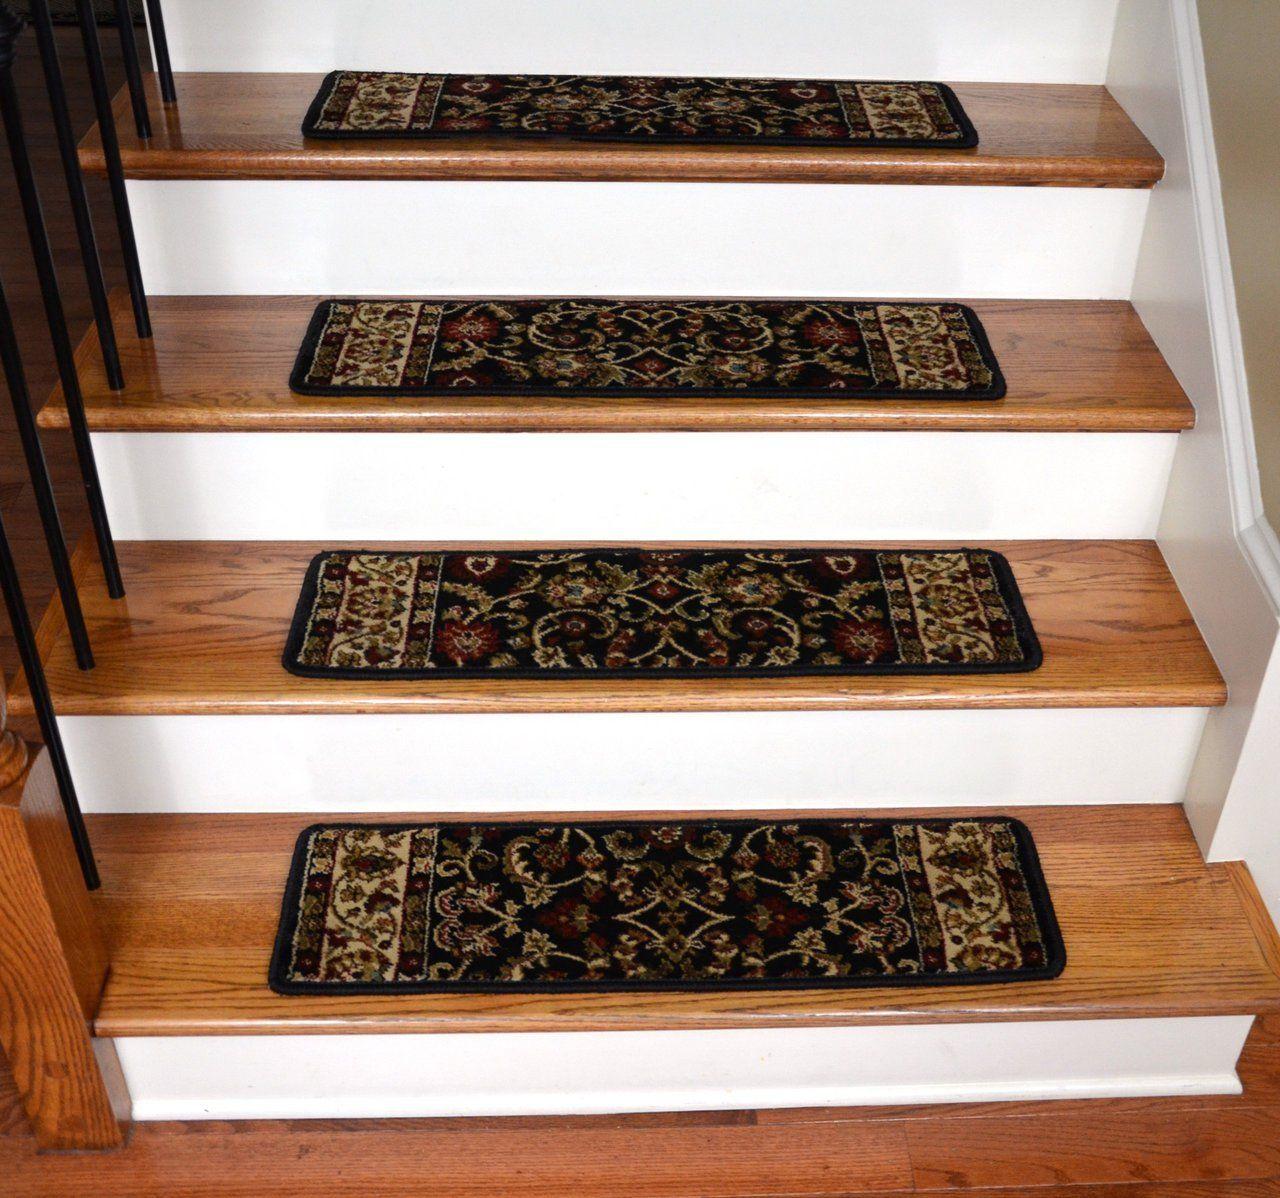 Best Dean Non Slip Tape Free Pet Friendly Stair Gripper Carpet 400 x 300